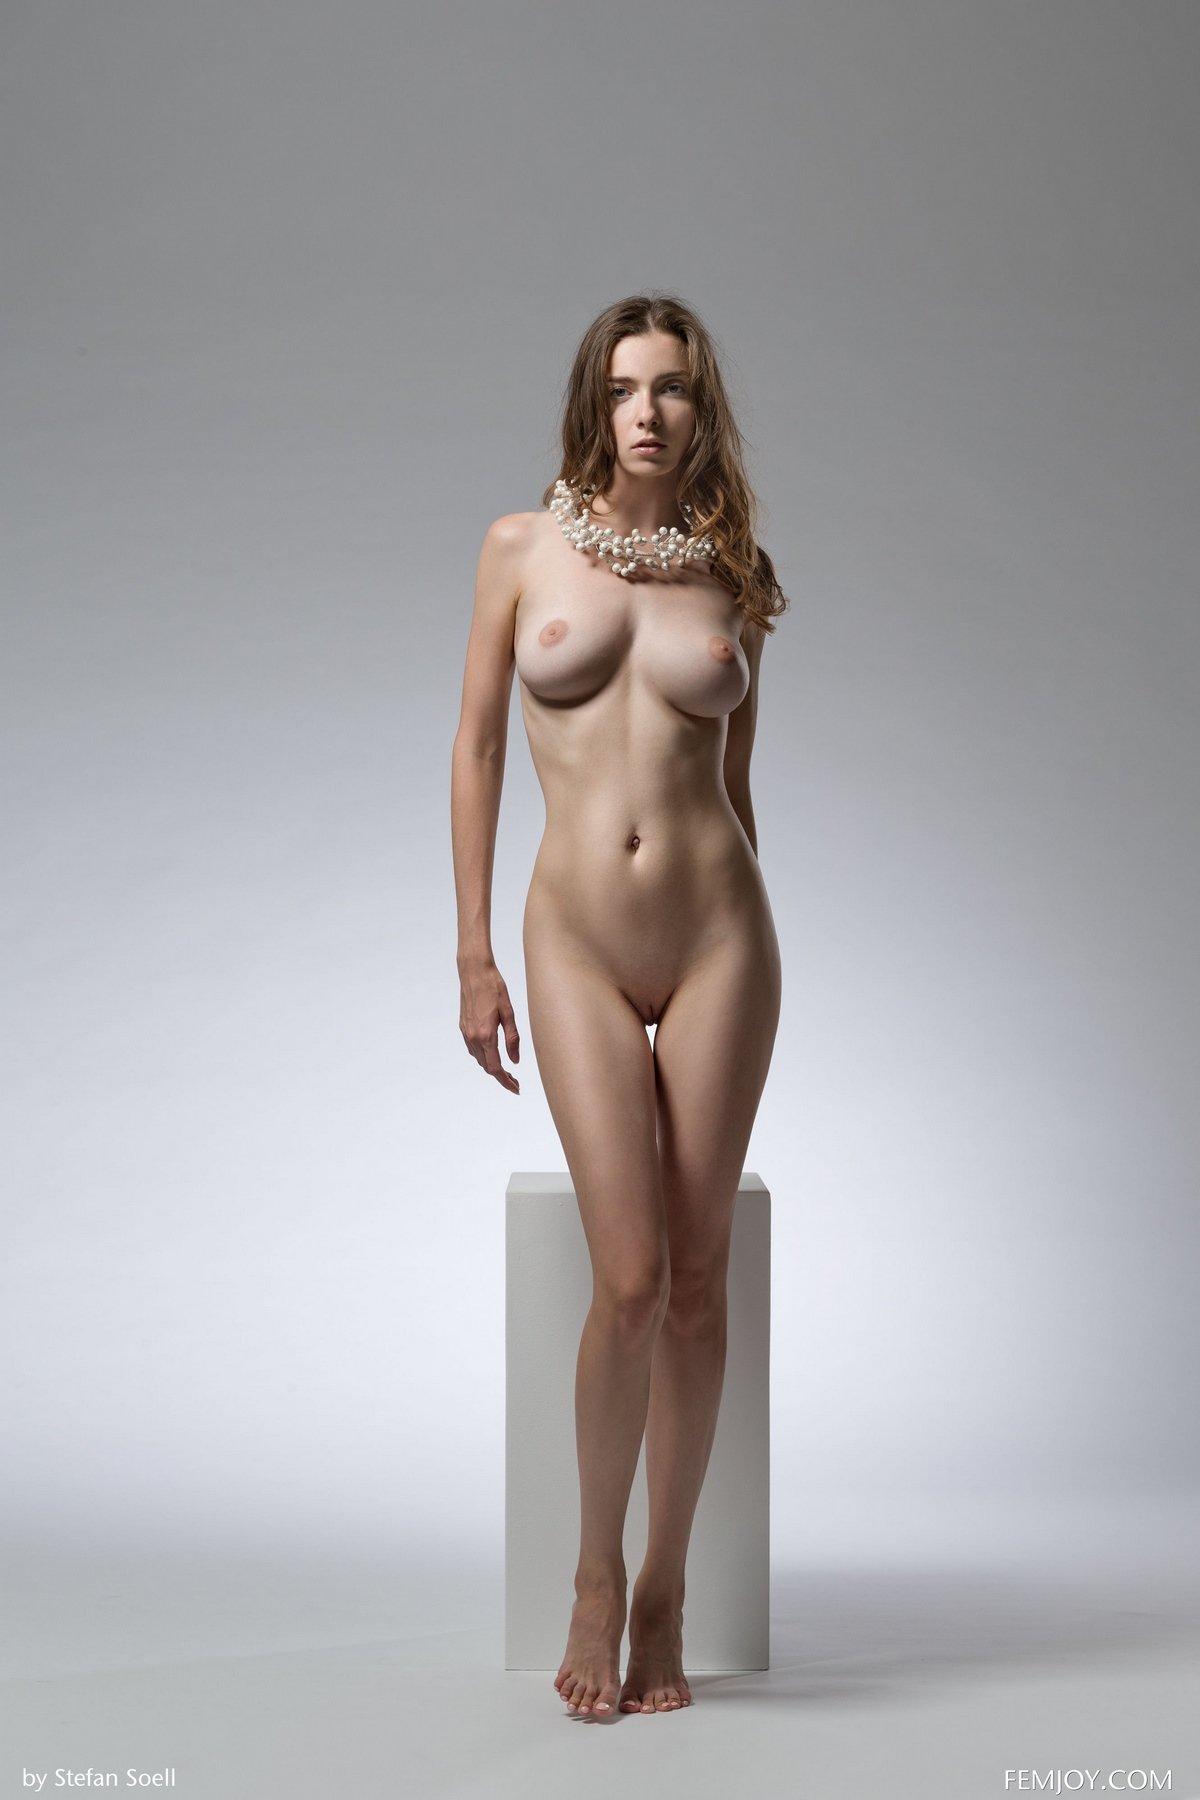 Фото модели Mariposa в студии на кубе